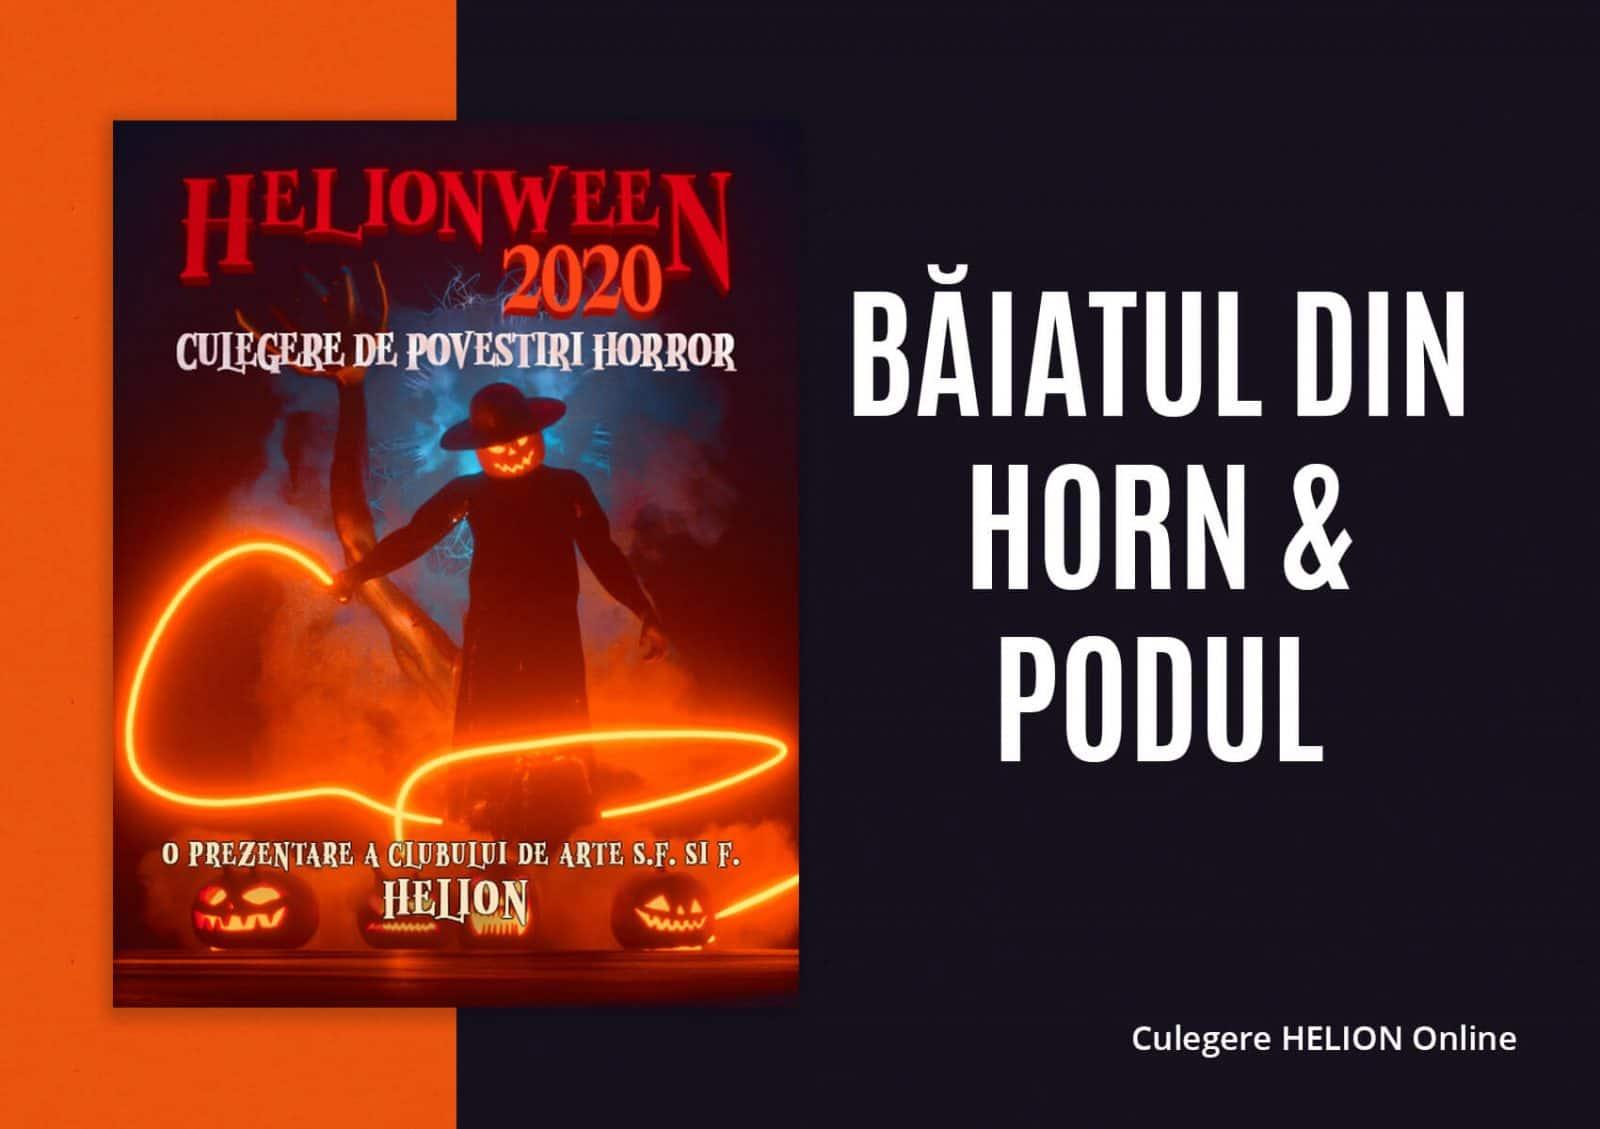 Helionween 2020